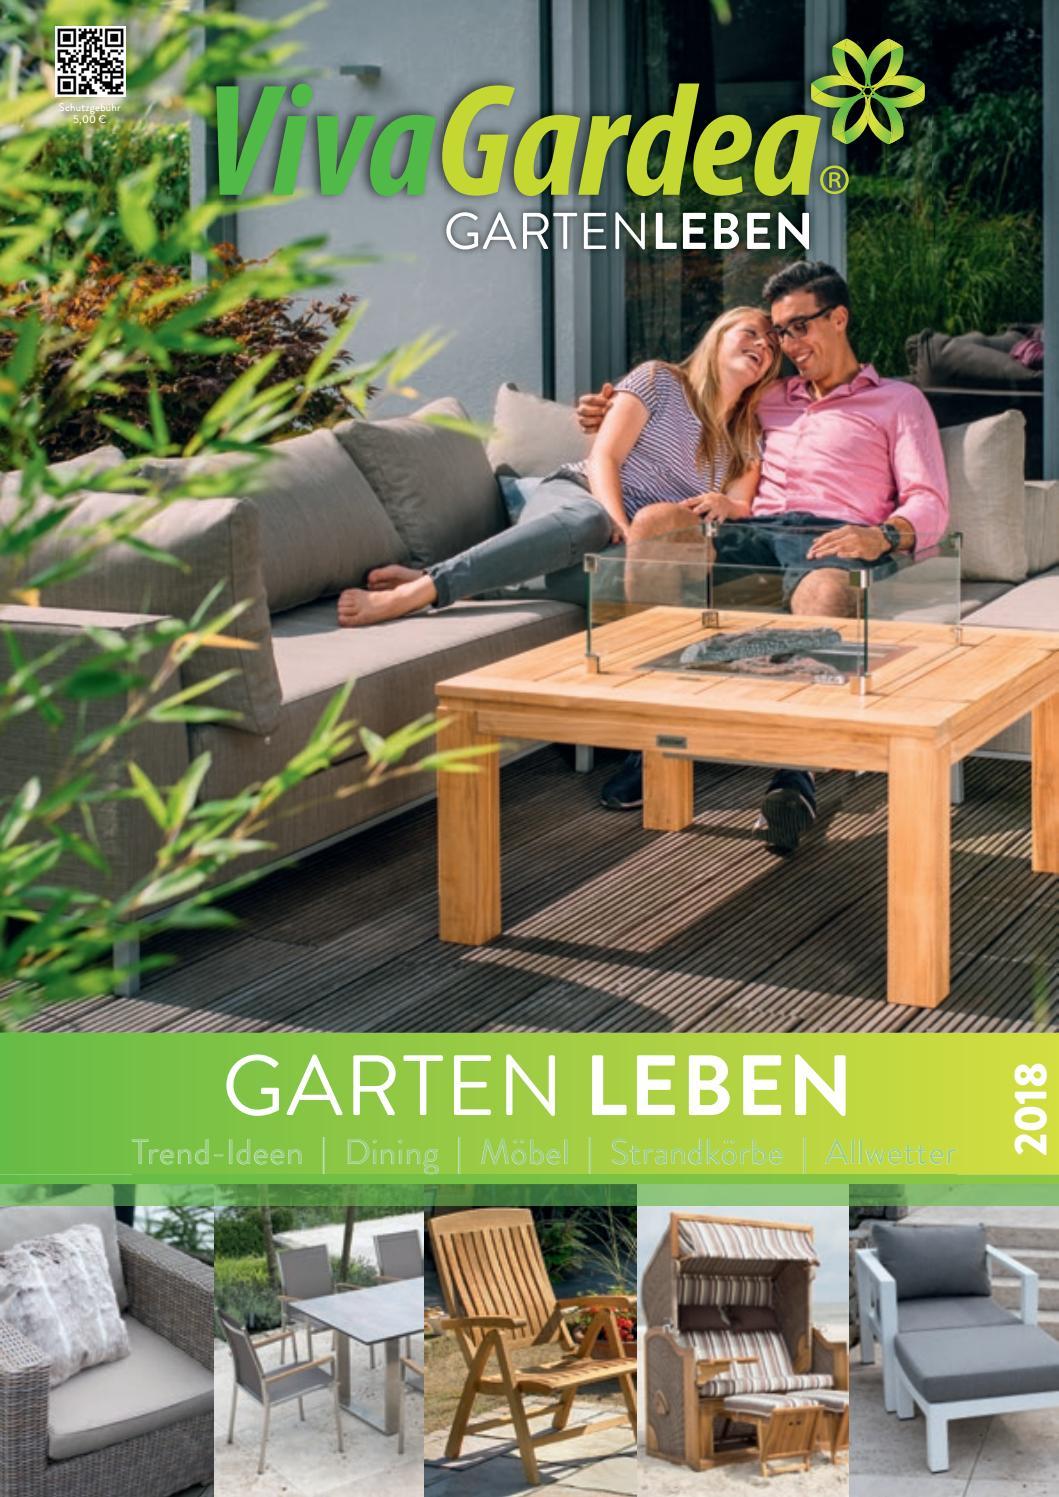 Vivagardea garten leben by Kaiser Design - issuu